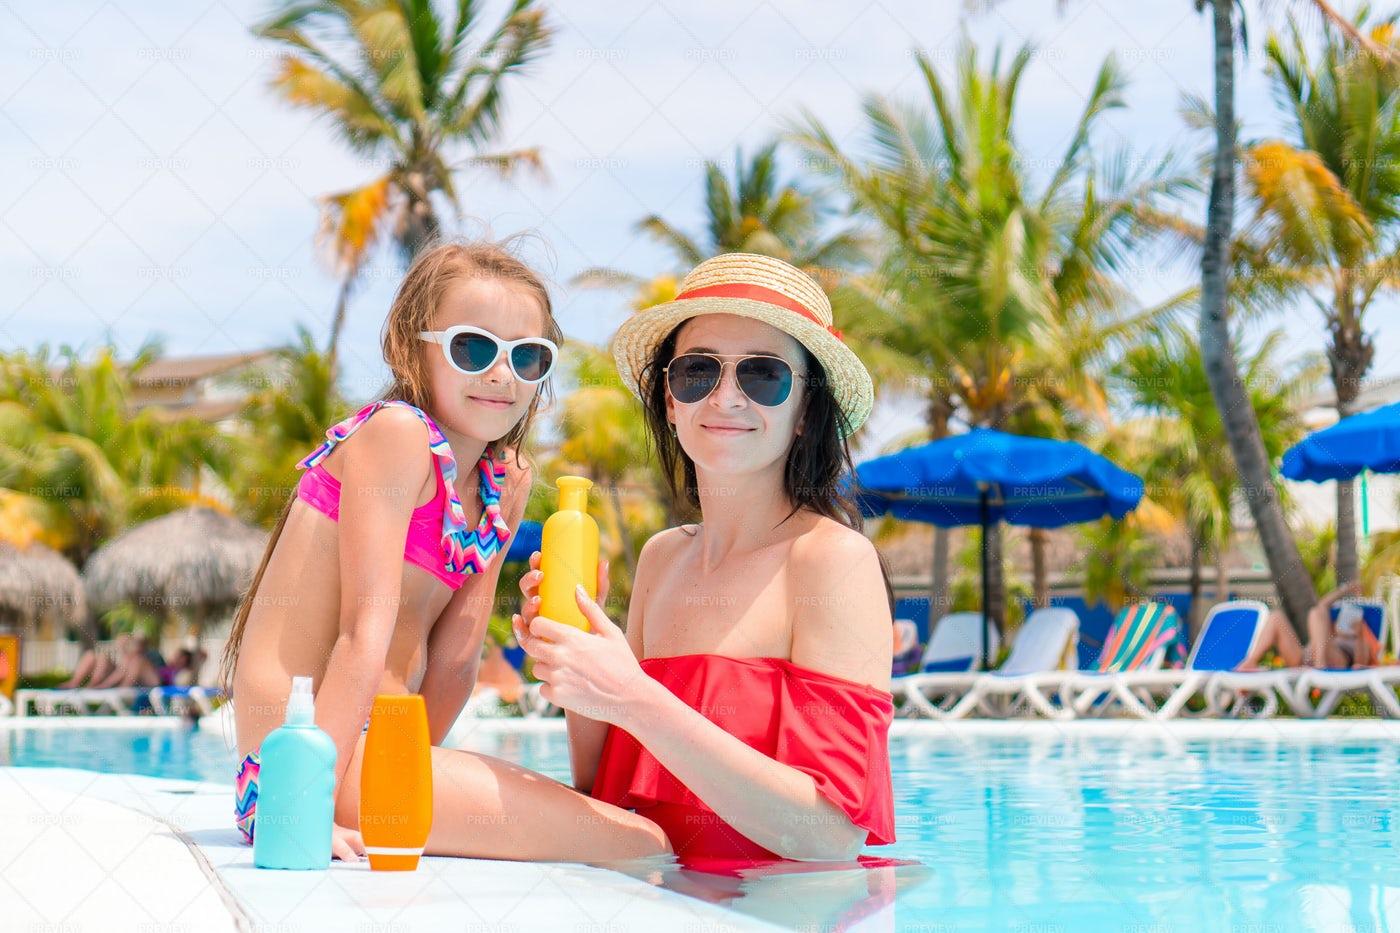 Holding A Sunscreen Bottle: Stock Photos